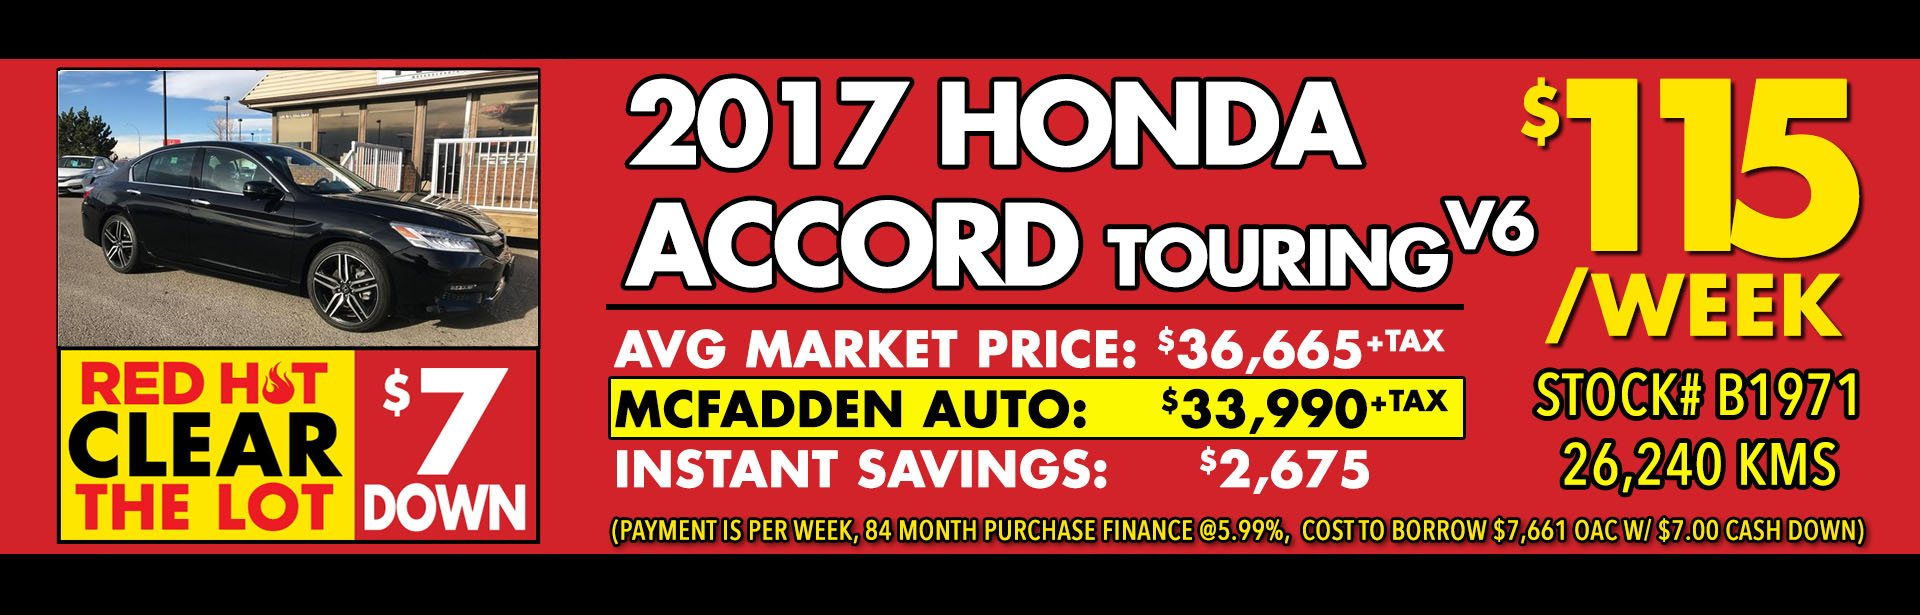 Red Hot - B1971 2017 Honda Accord Touring V6 - Feb 2018